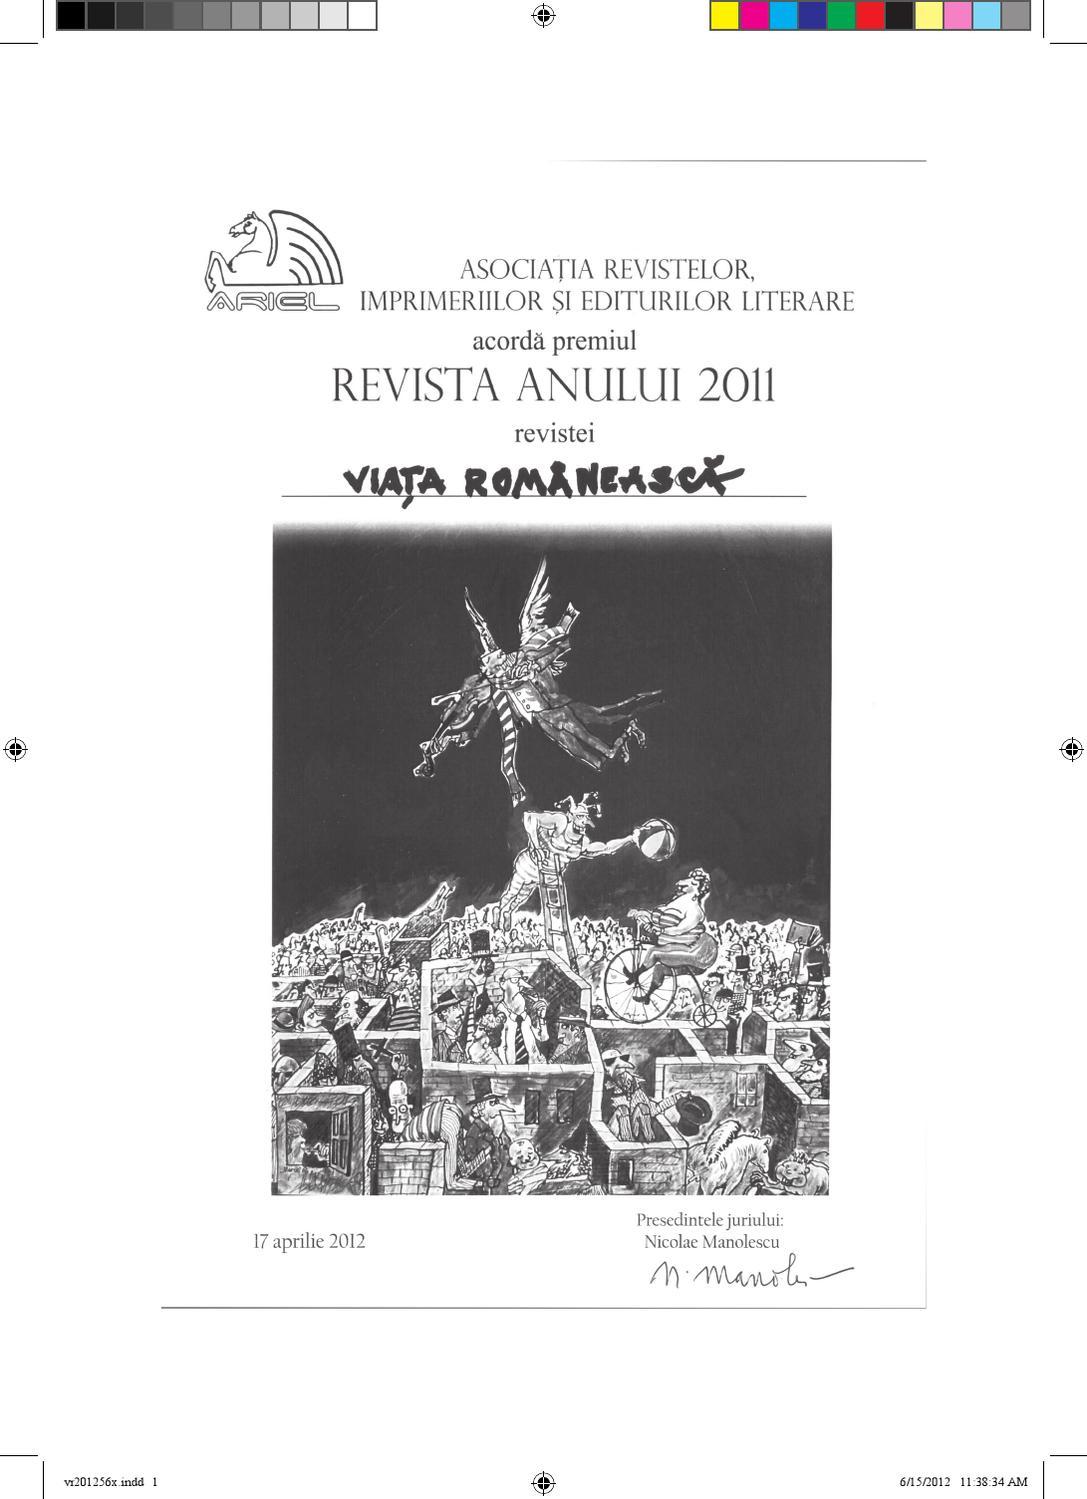 (PDF) Narcotice in cultura romana - Andrei Oisteanu | Trimuri Shiva - alaskanmalamutes.ro